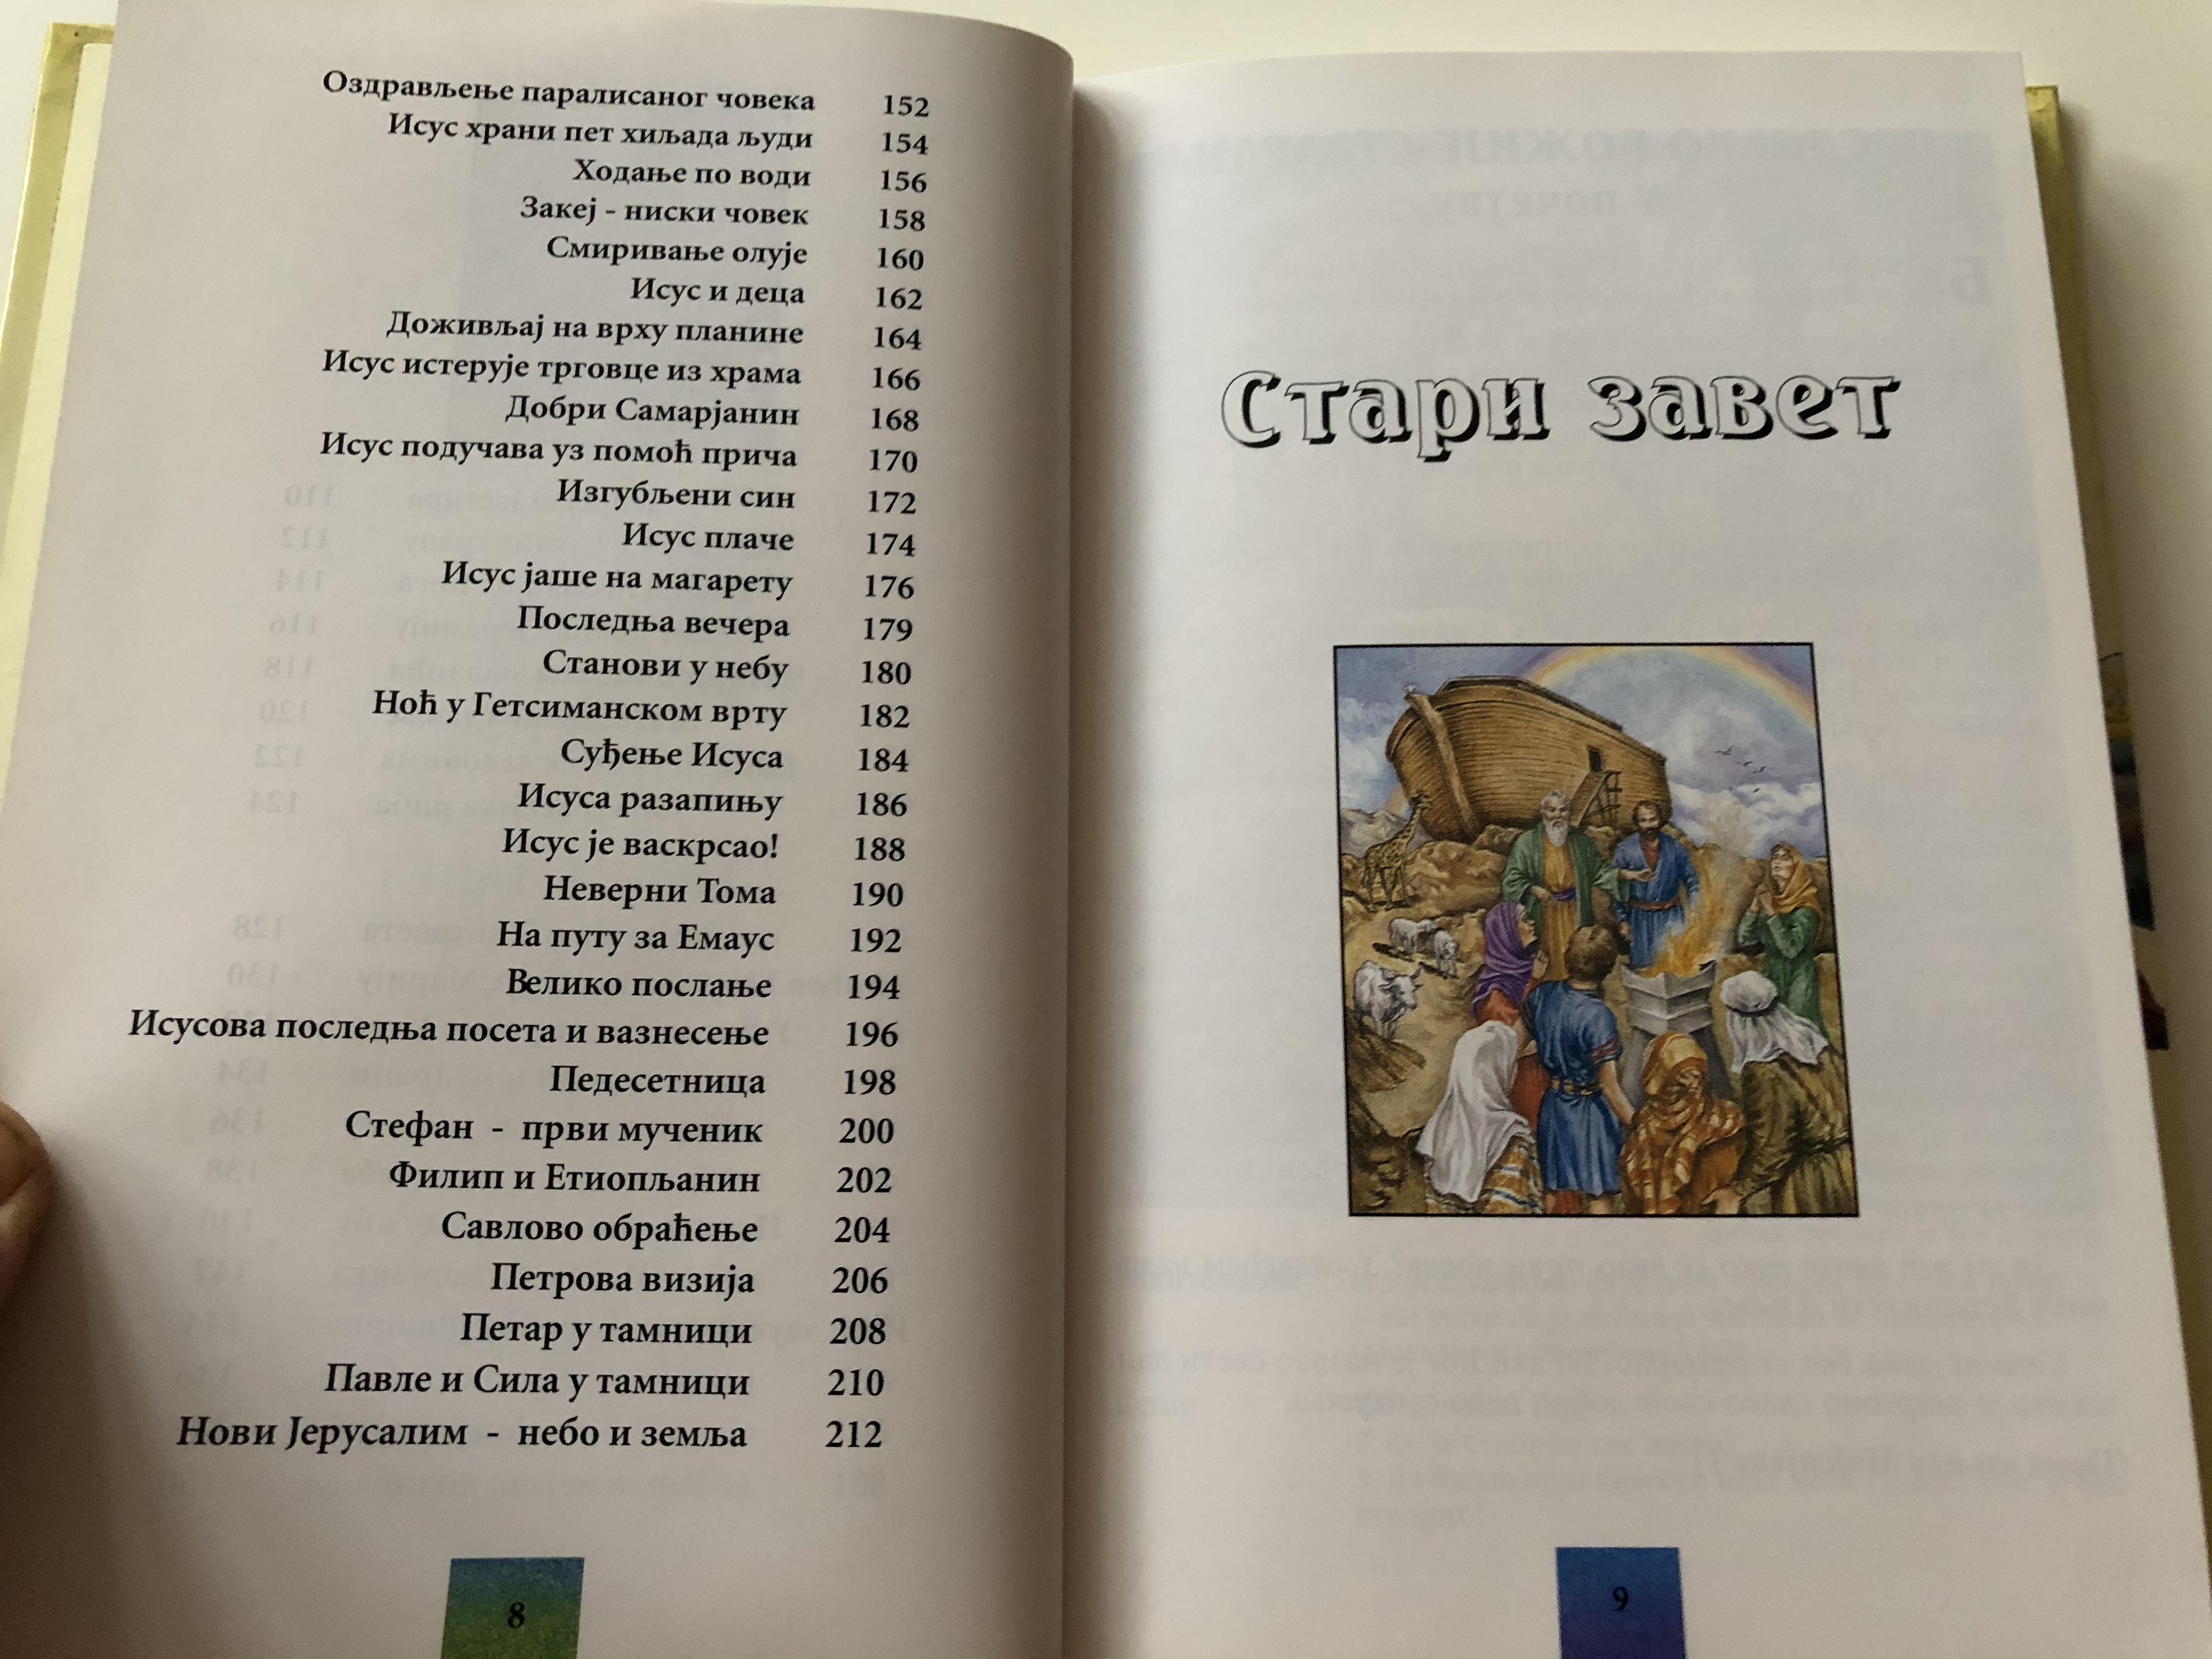 6.-serbian101favstoriesfrombible.jpg